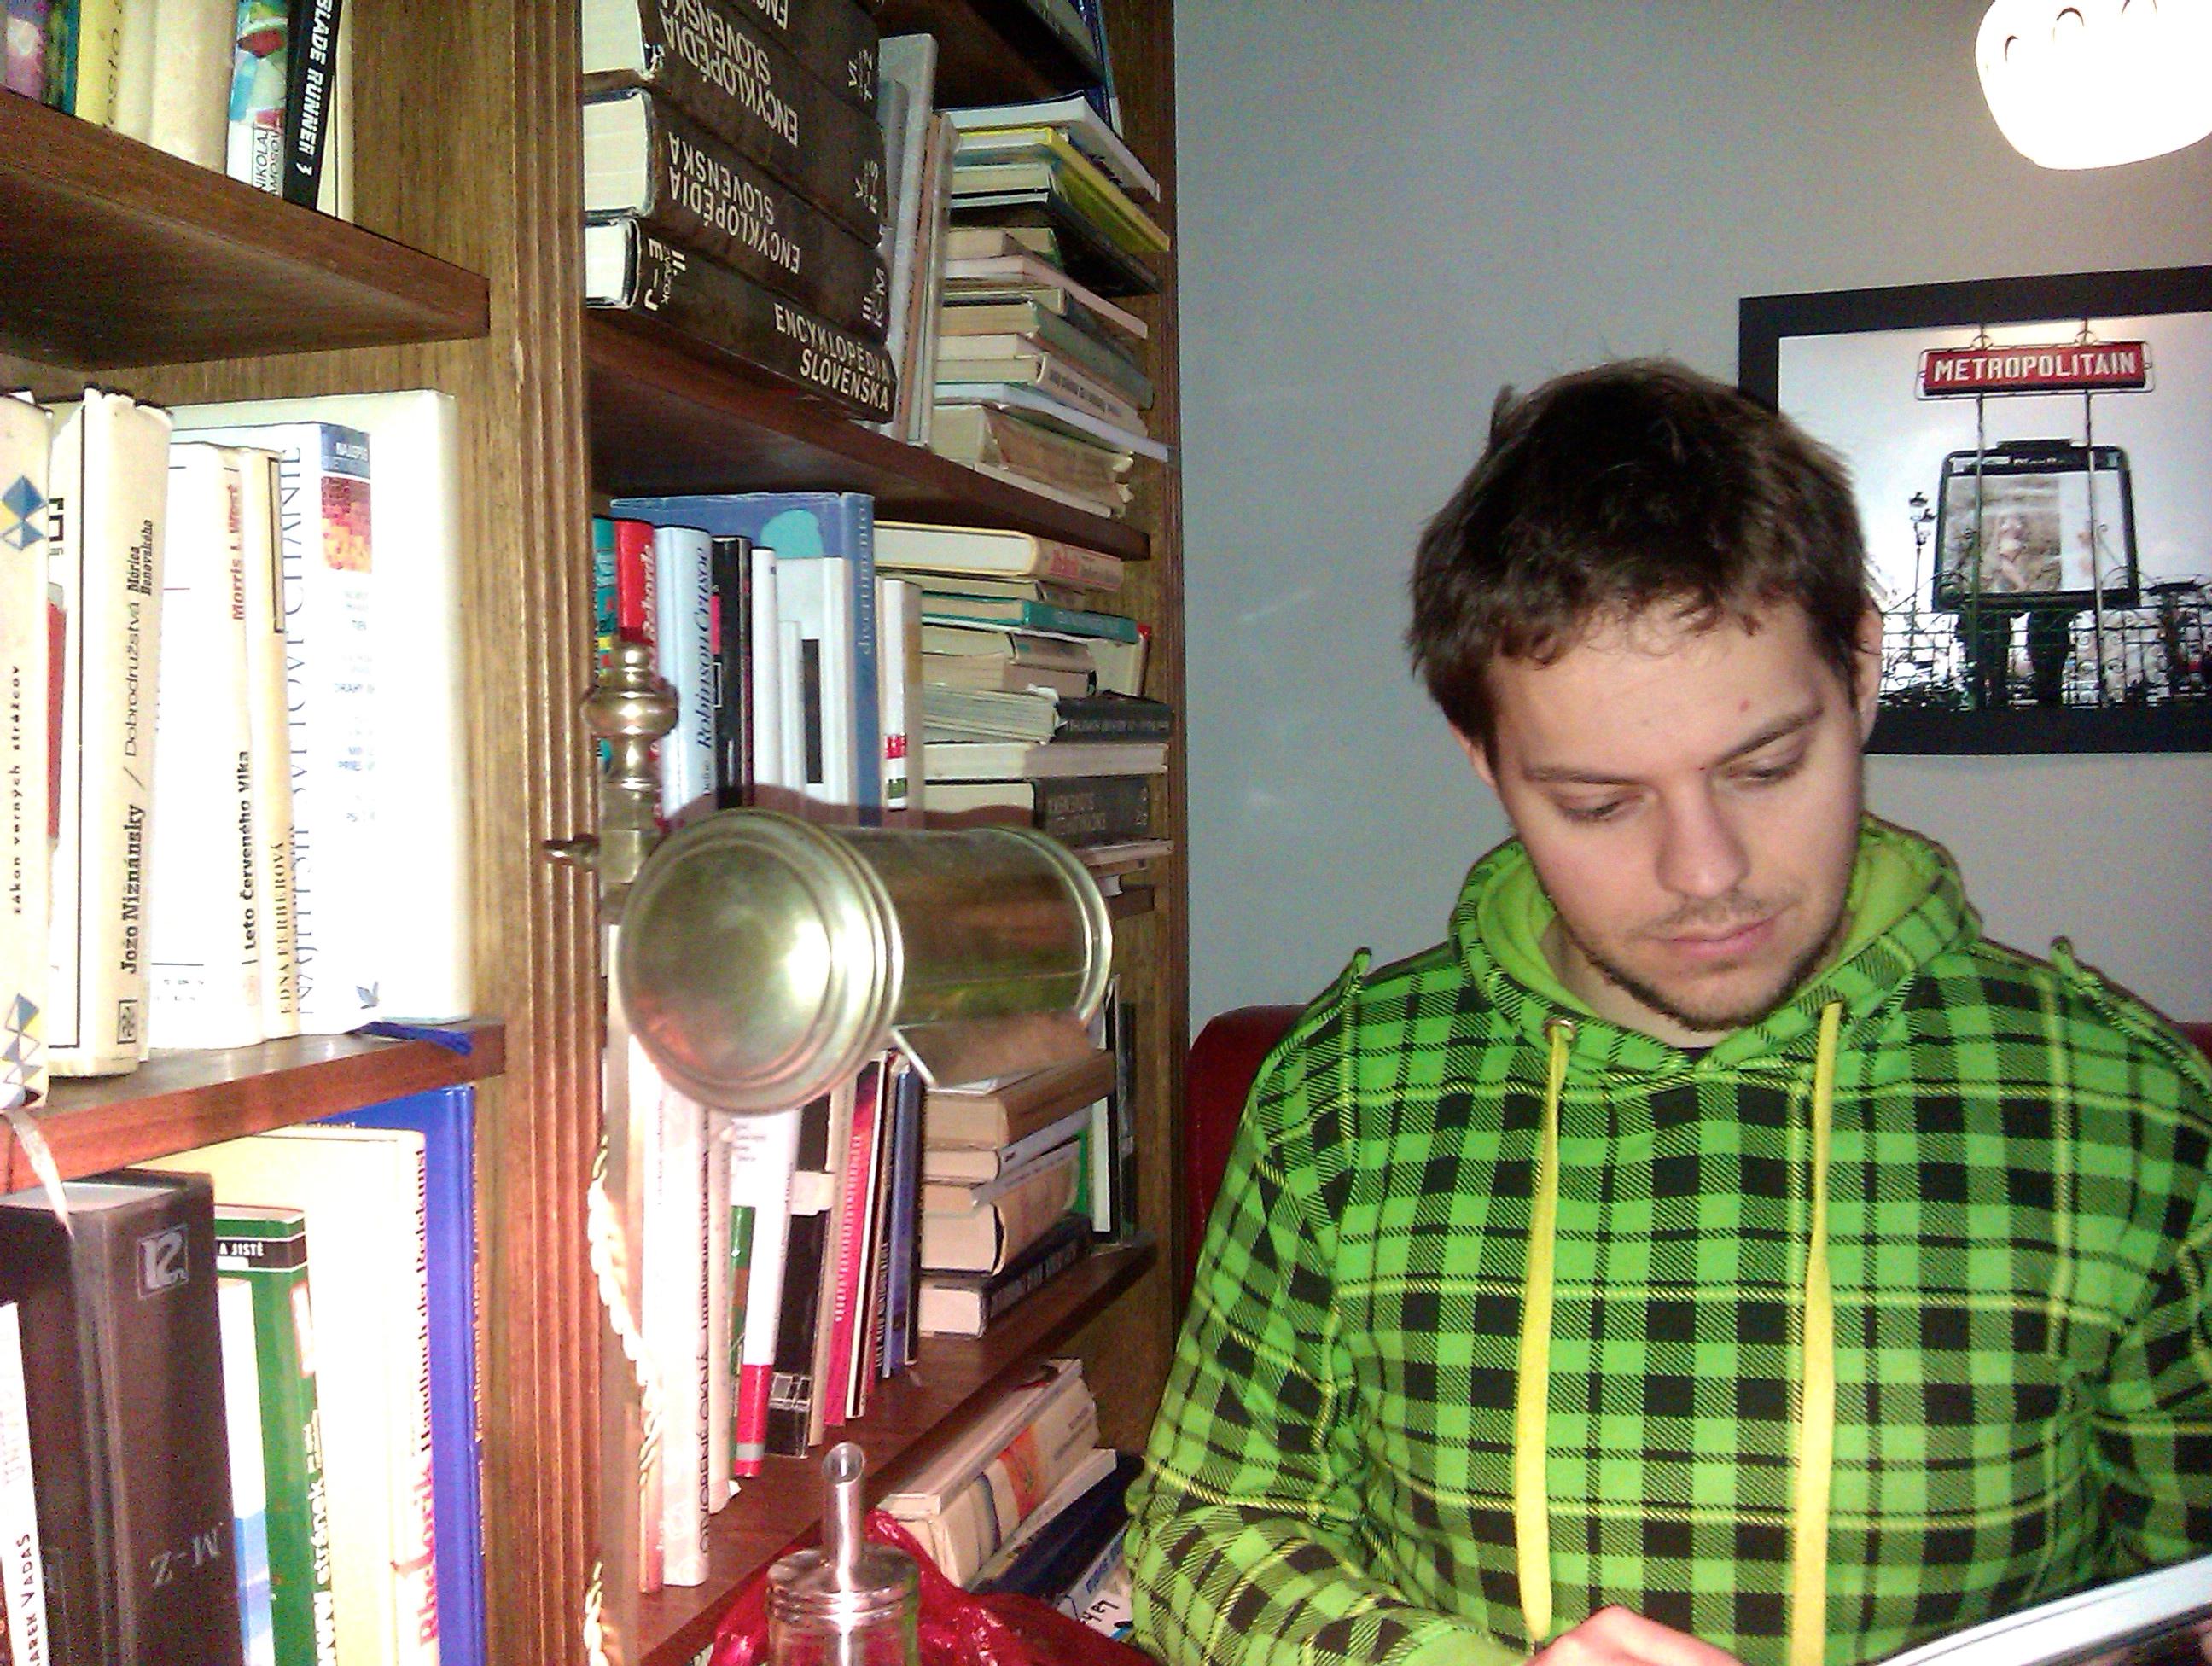 Bistro St. Germain Books